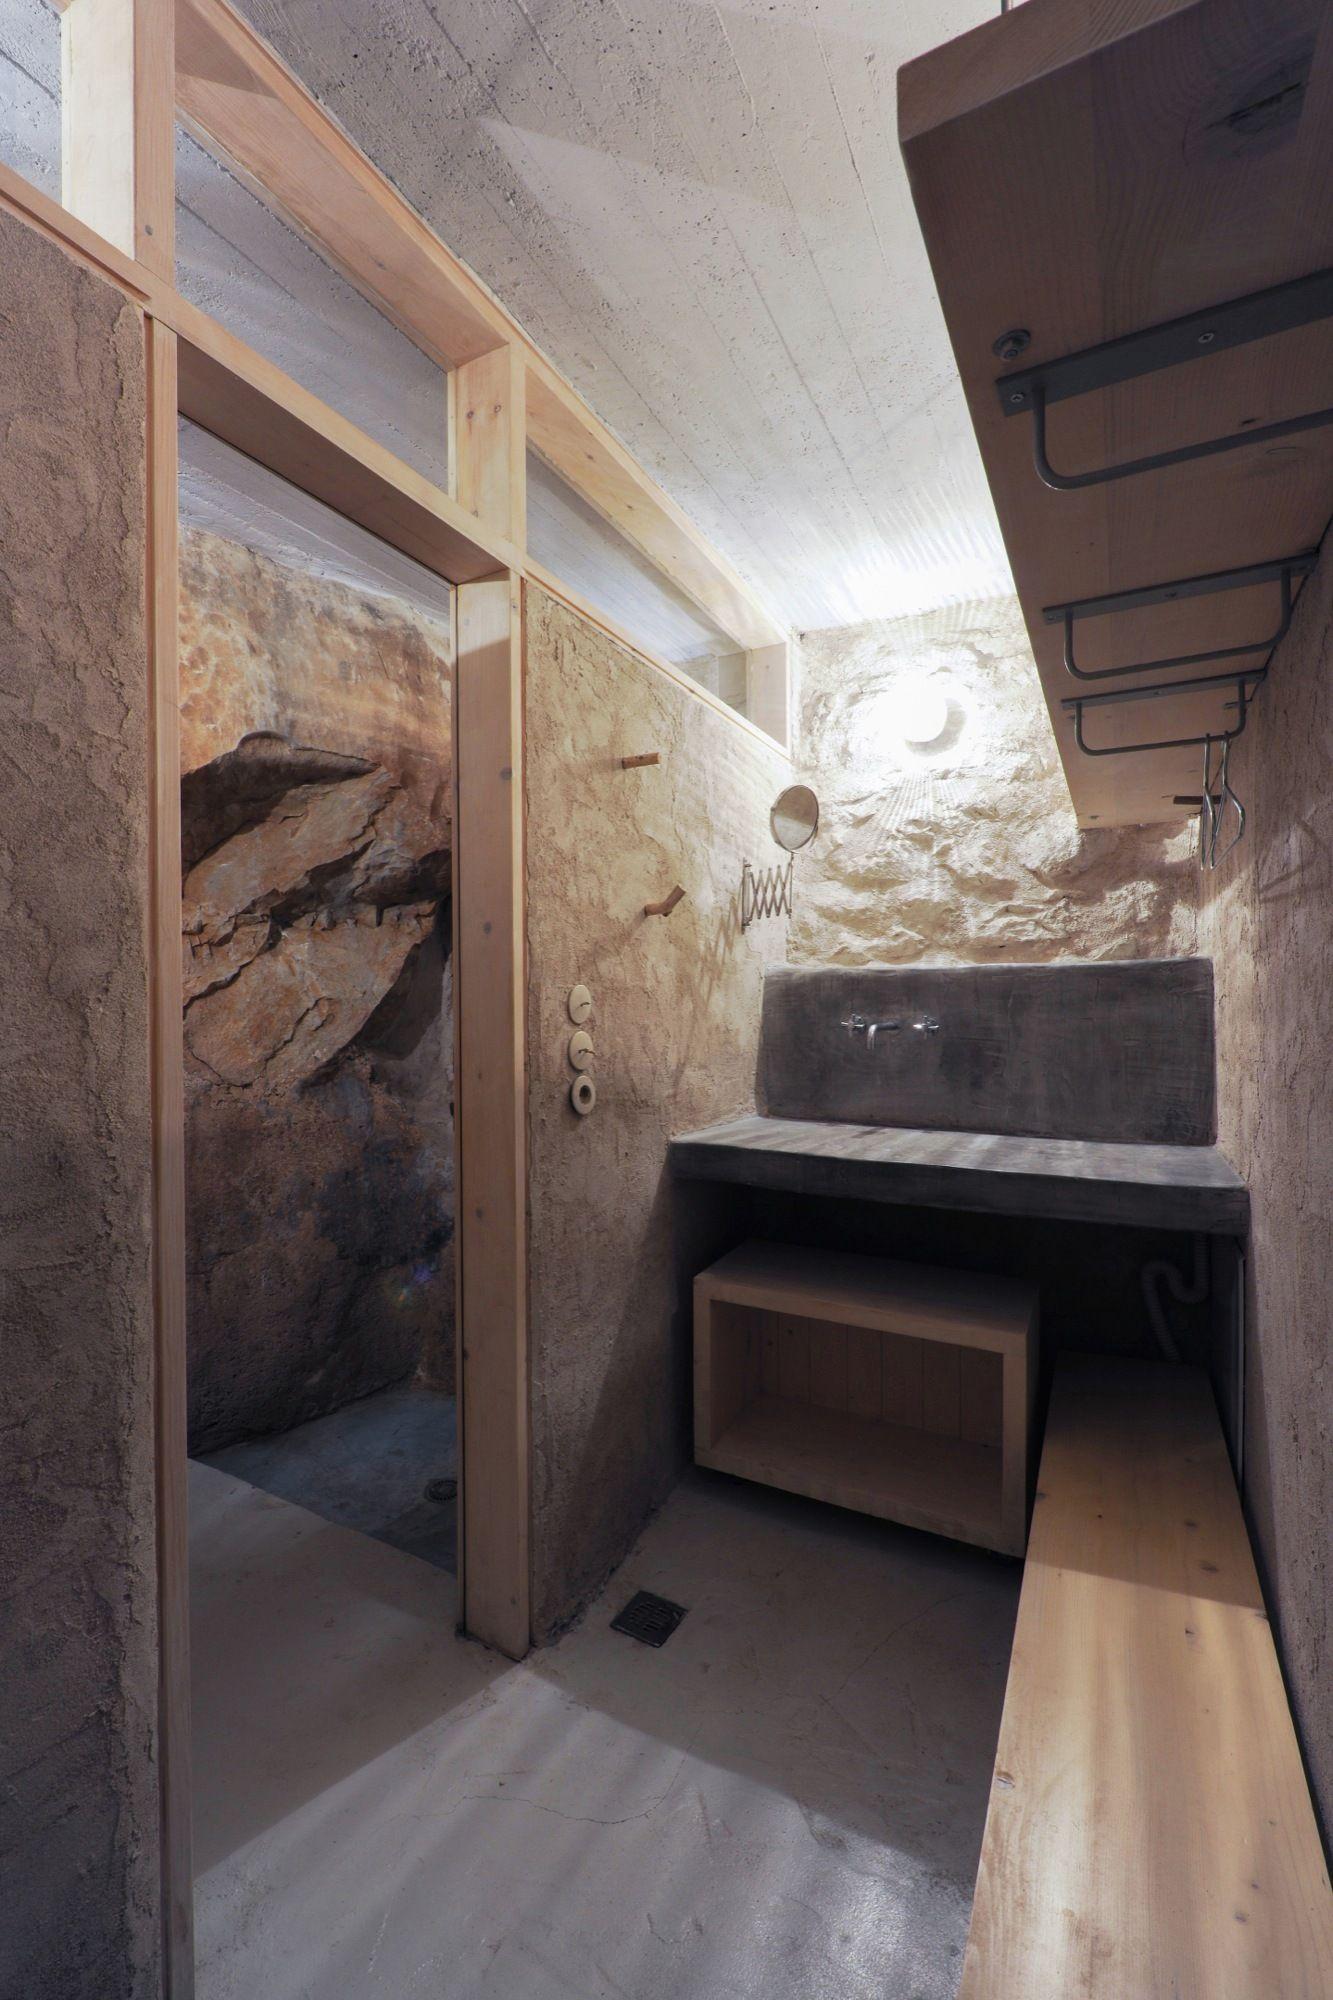 Mani tower house bathroom